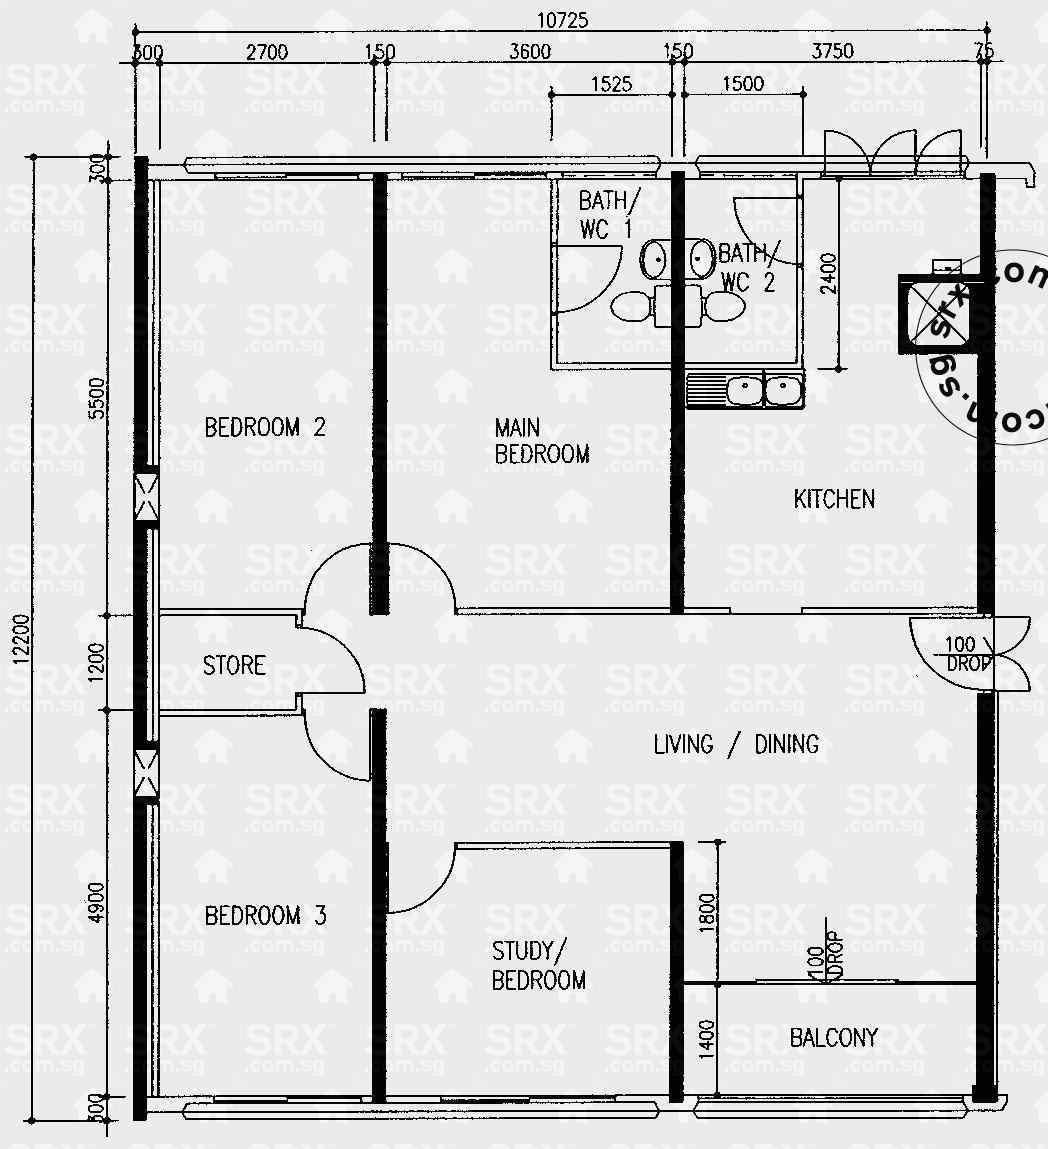 Floor plans for pasir ris drive 6 hdb details srx property for 509 plans